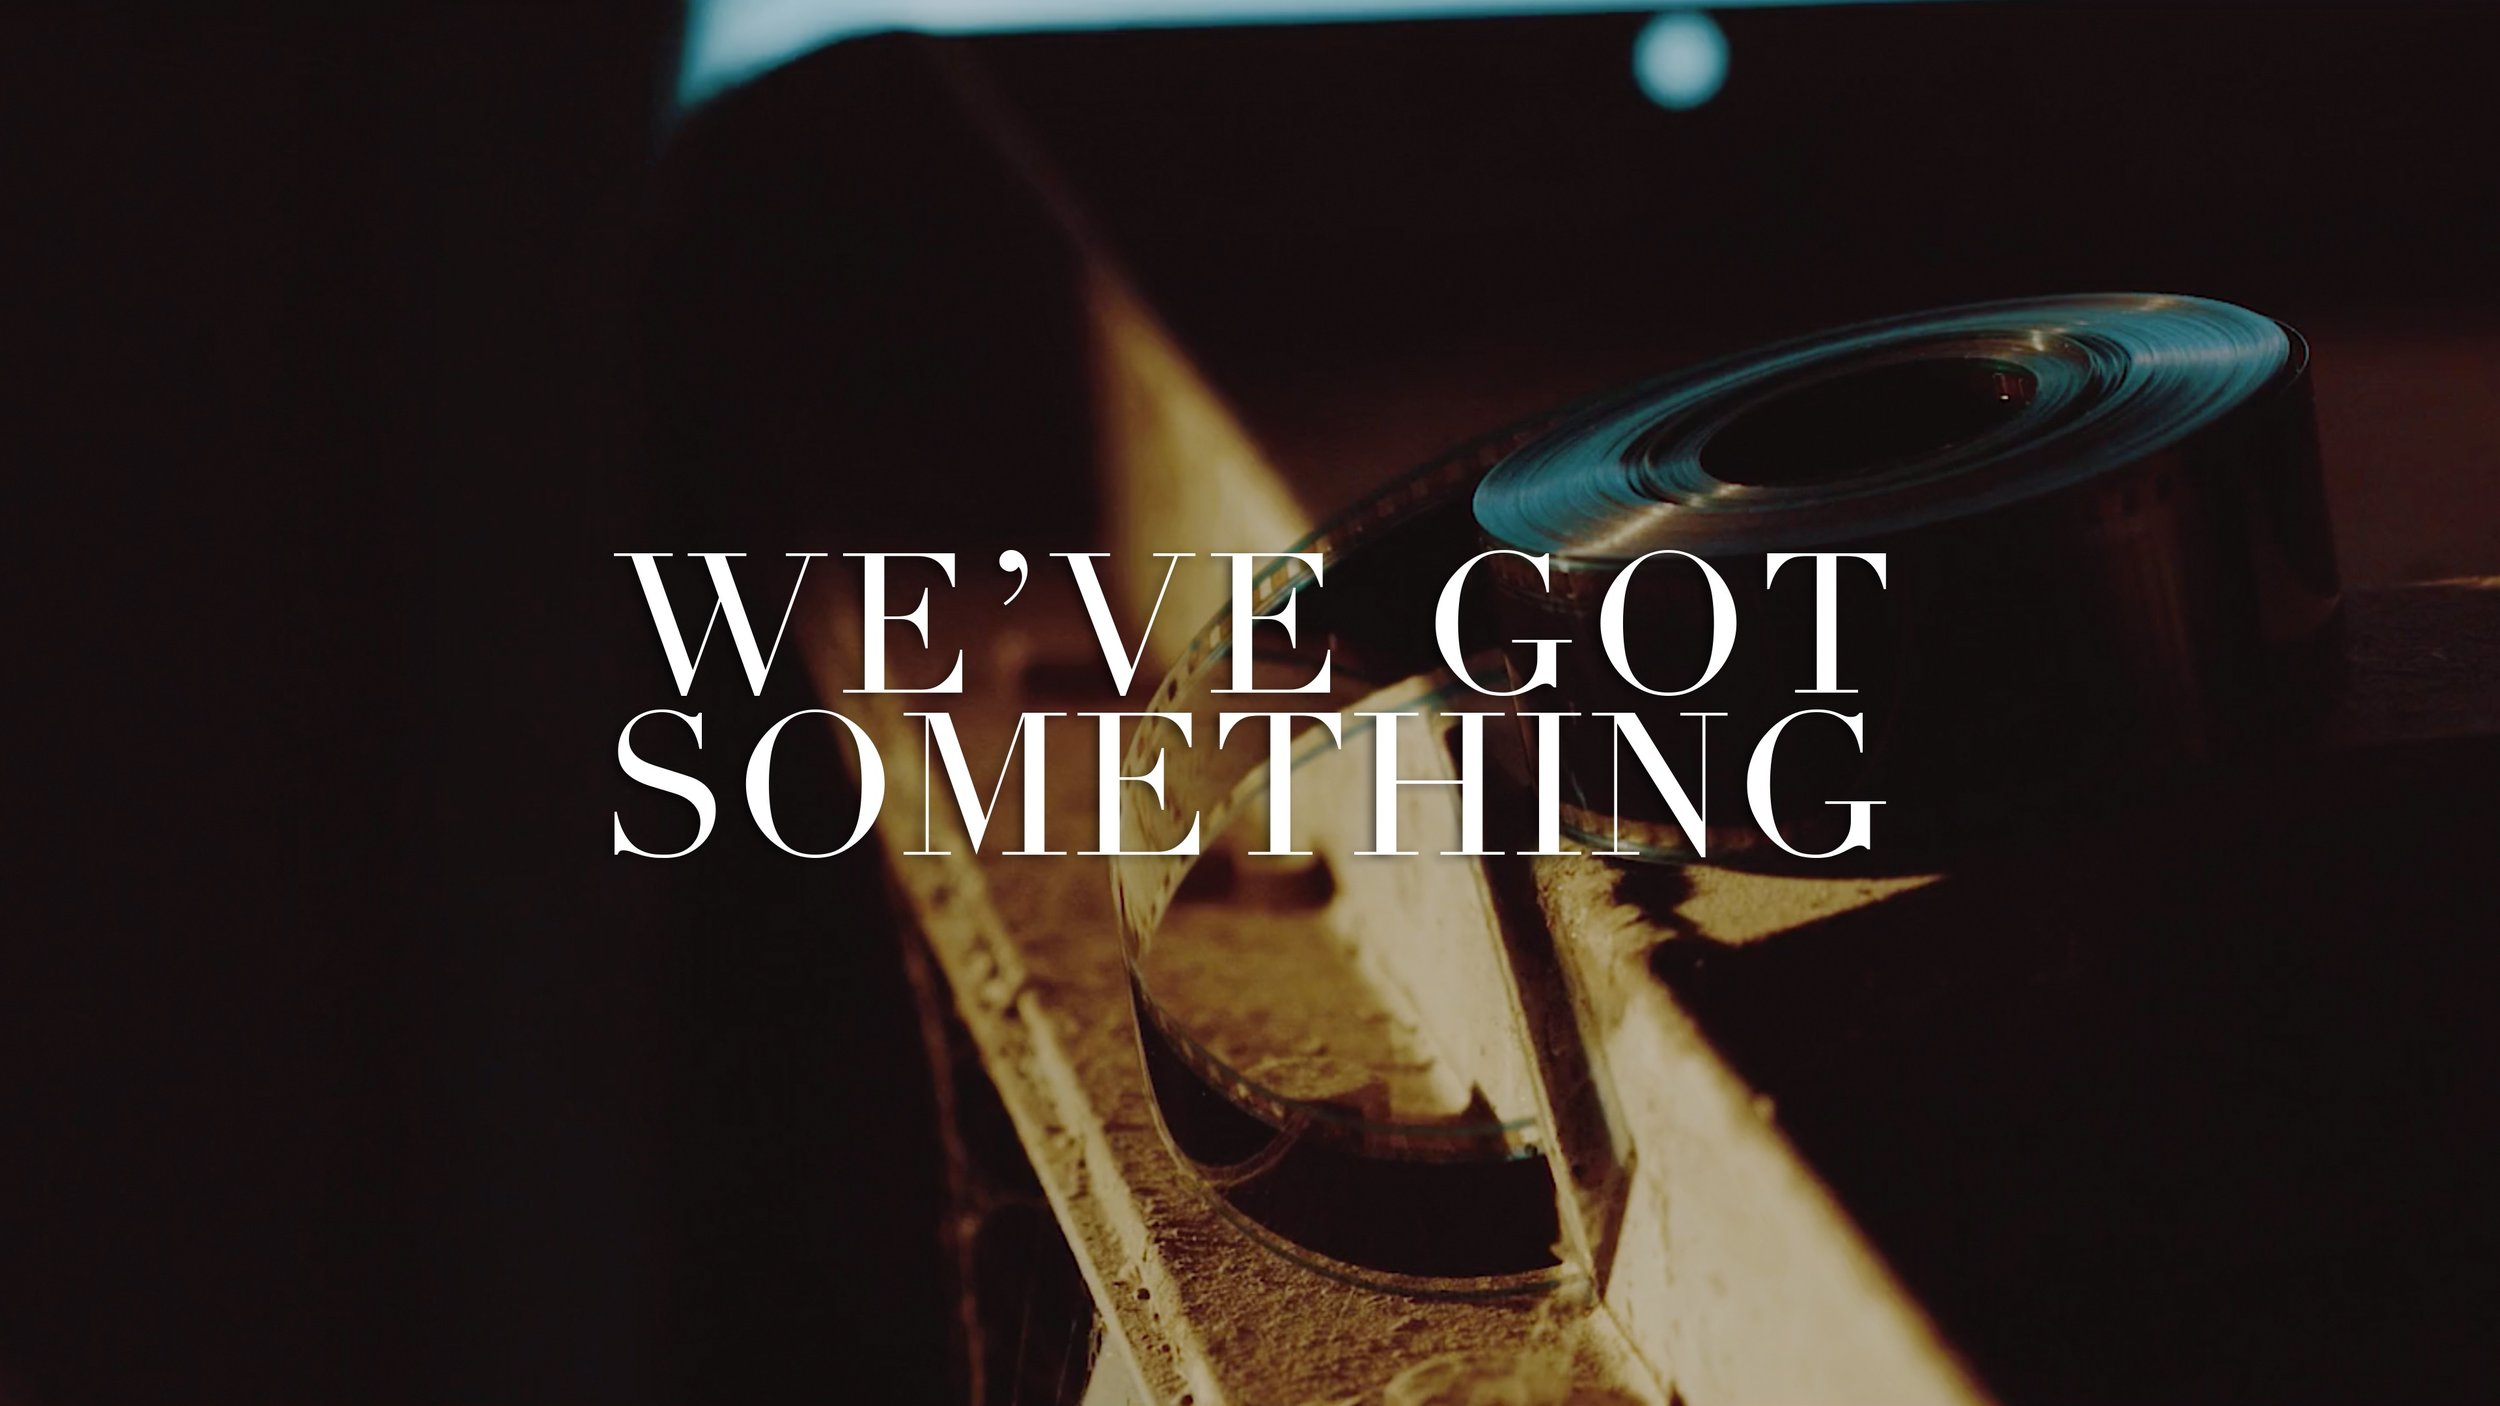 T_We've_Got_Something-squashed.jpg